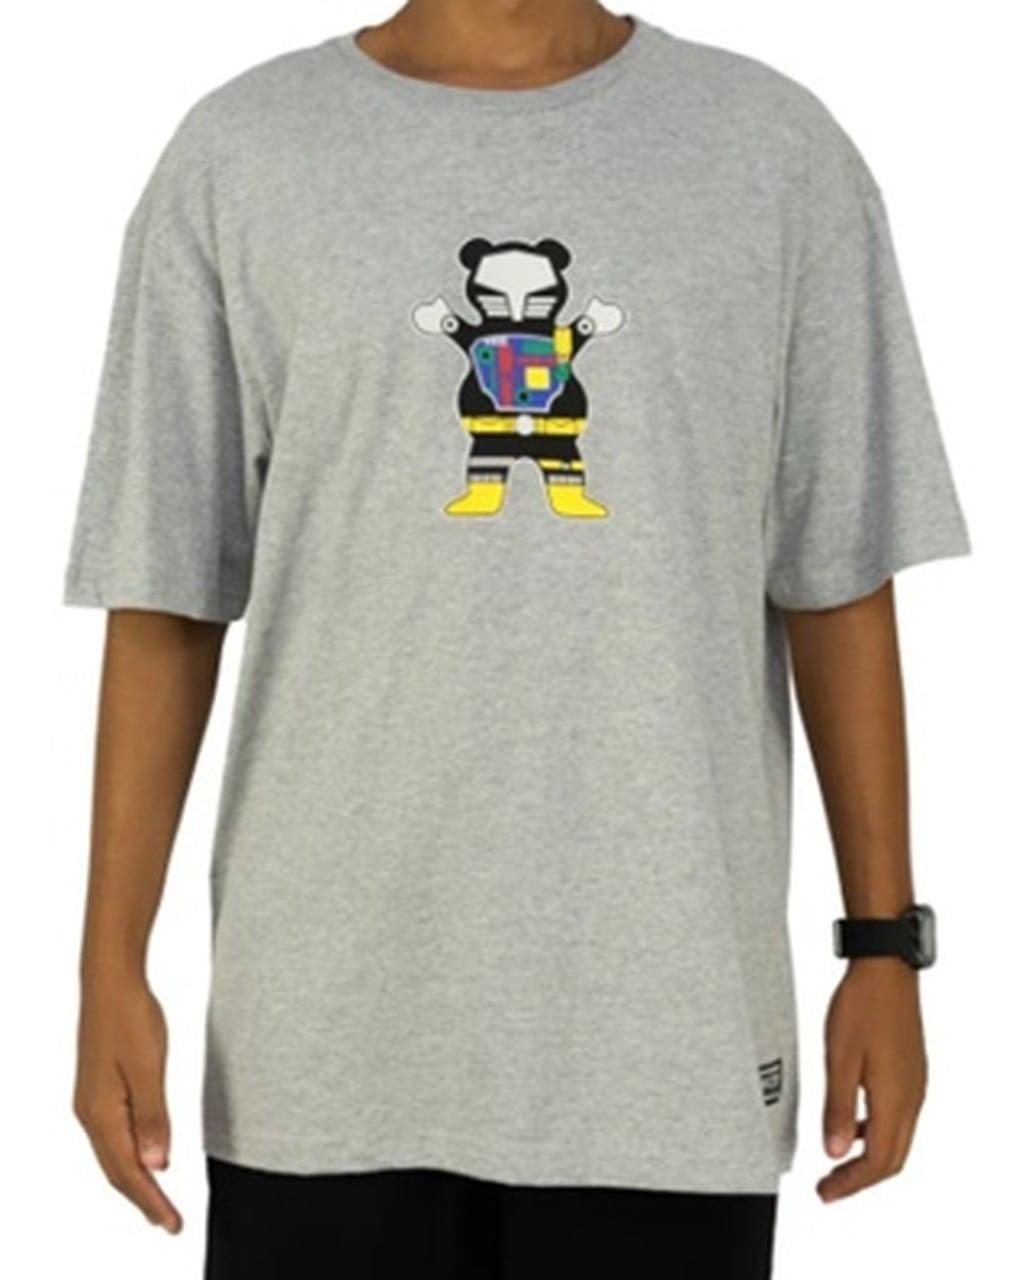 Camiseta Grizzly Chris Cole Robot Tee Heather Grey